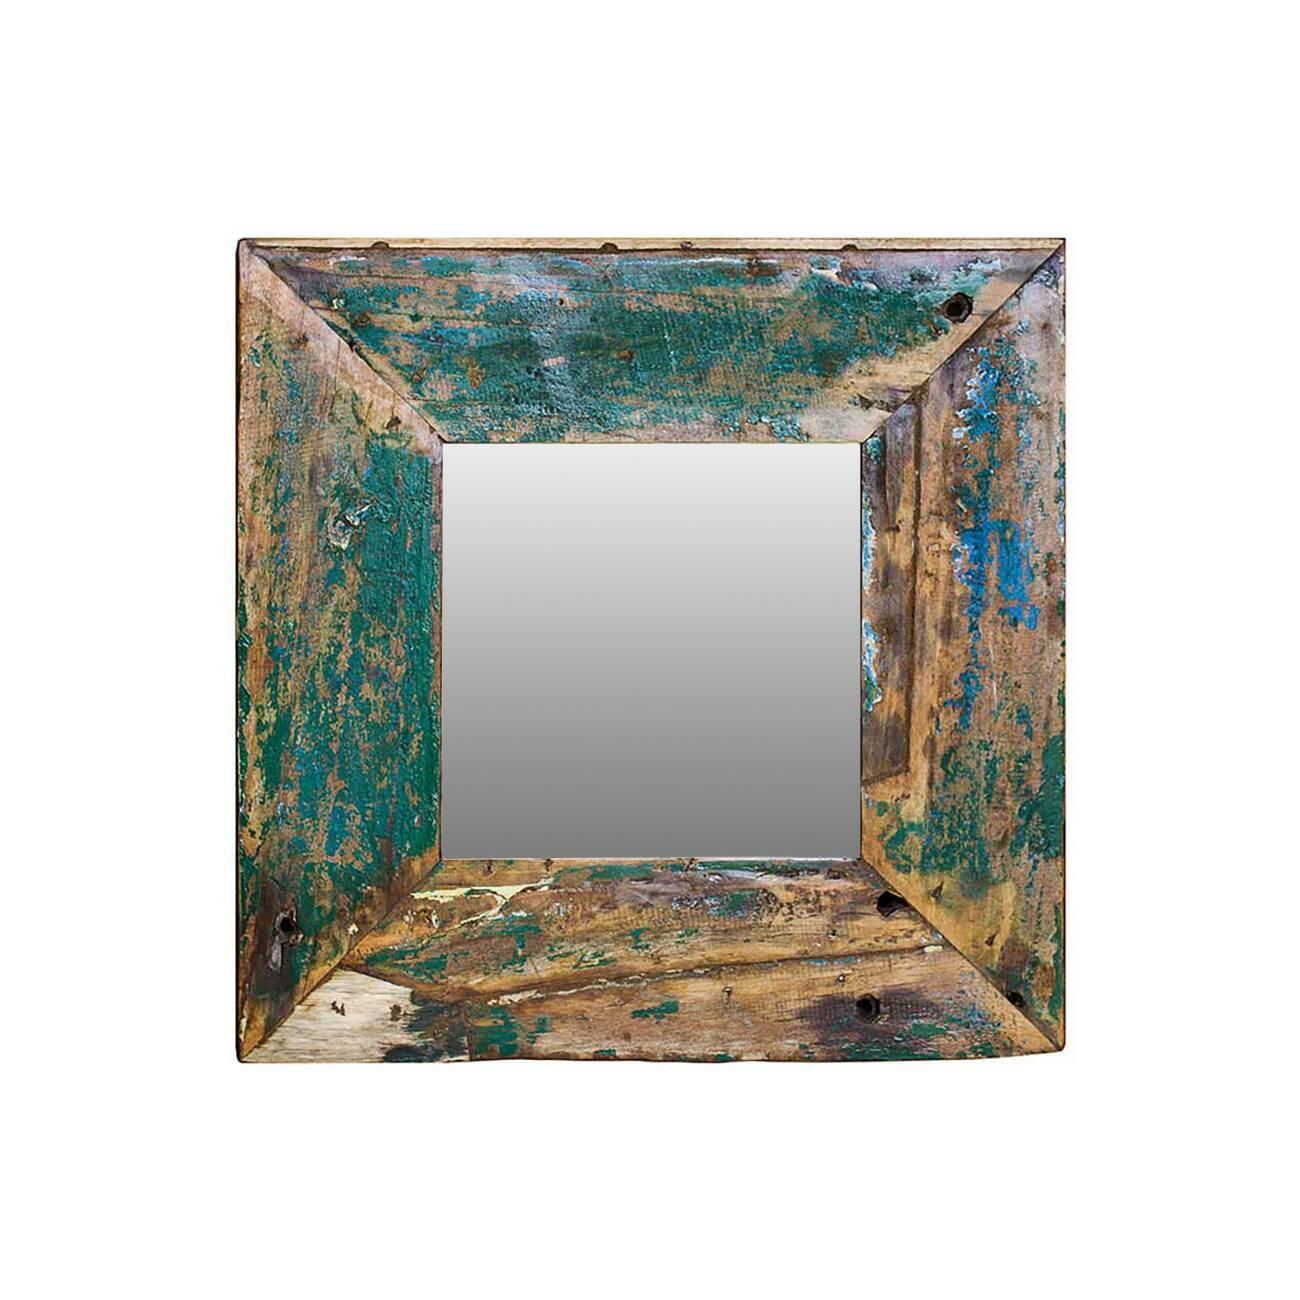 Зеркало Like Lodka 15576167 от Cosmorelax